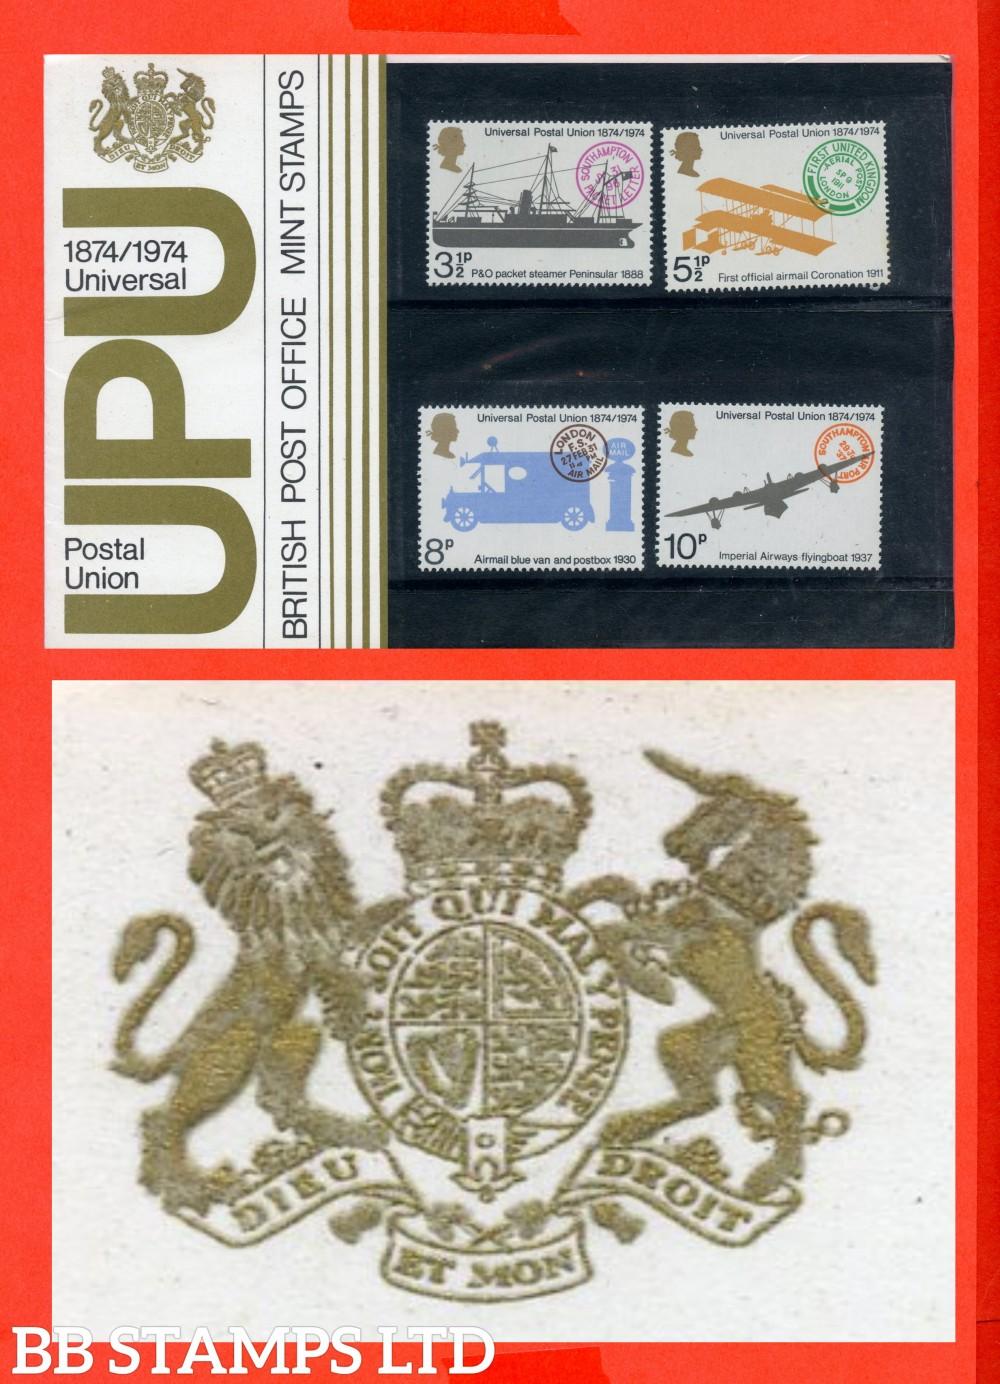 1974 U.P.U. Universal Postal Union Pres Pack Type B = Flower Between Unicorn's Legs)